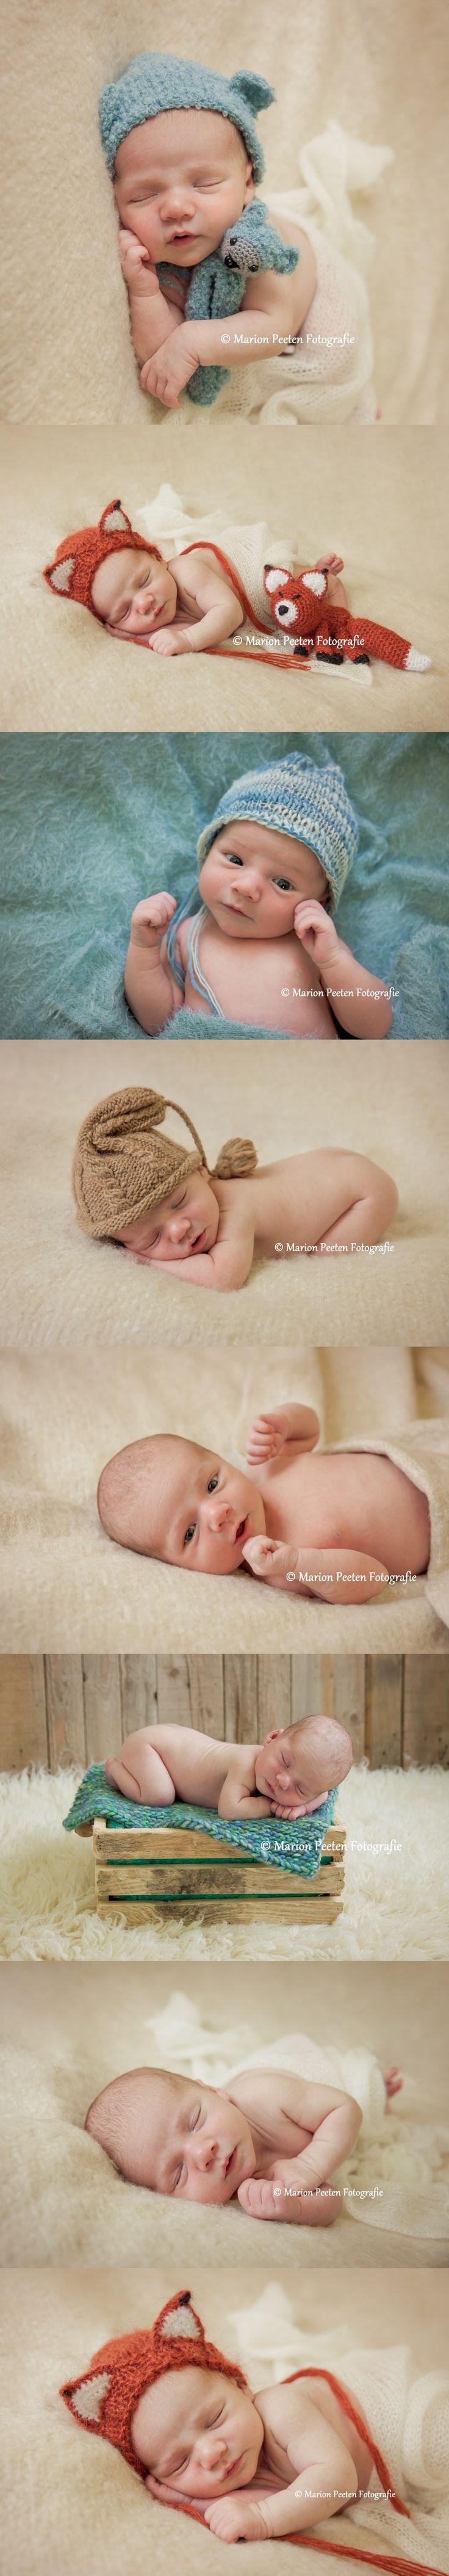 newborn fotografie,newborn photography, studio photograpy, studio fotografie,pasgeboren baby fotografie, little newborn fox, little newborn bear